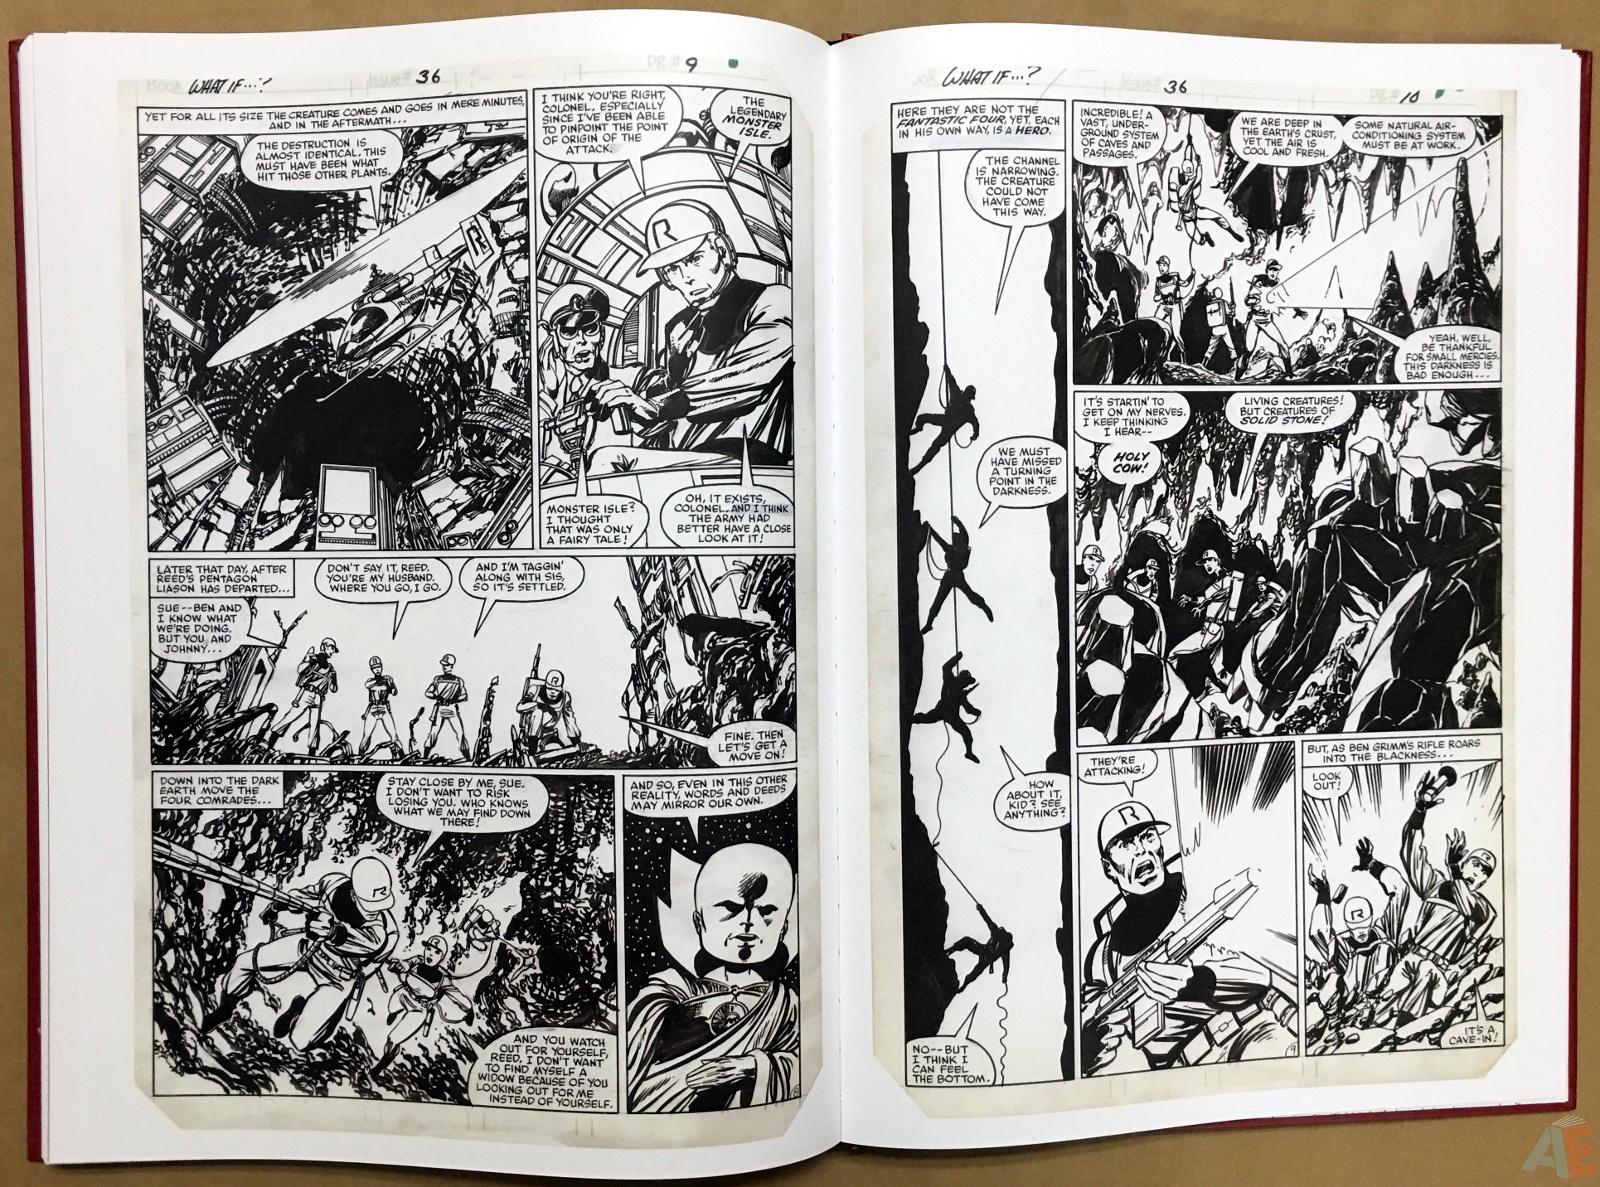 John Byrne's The Fantastic Four Artist's Edition 48